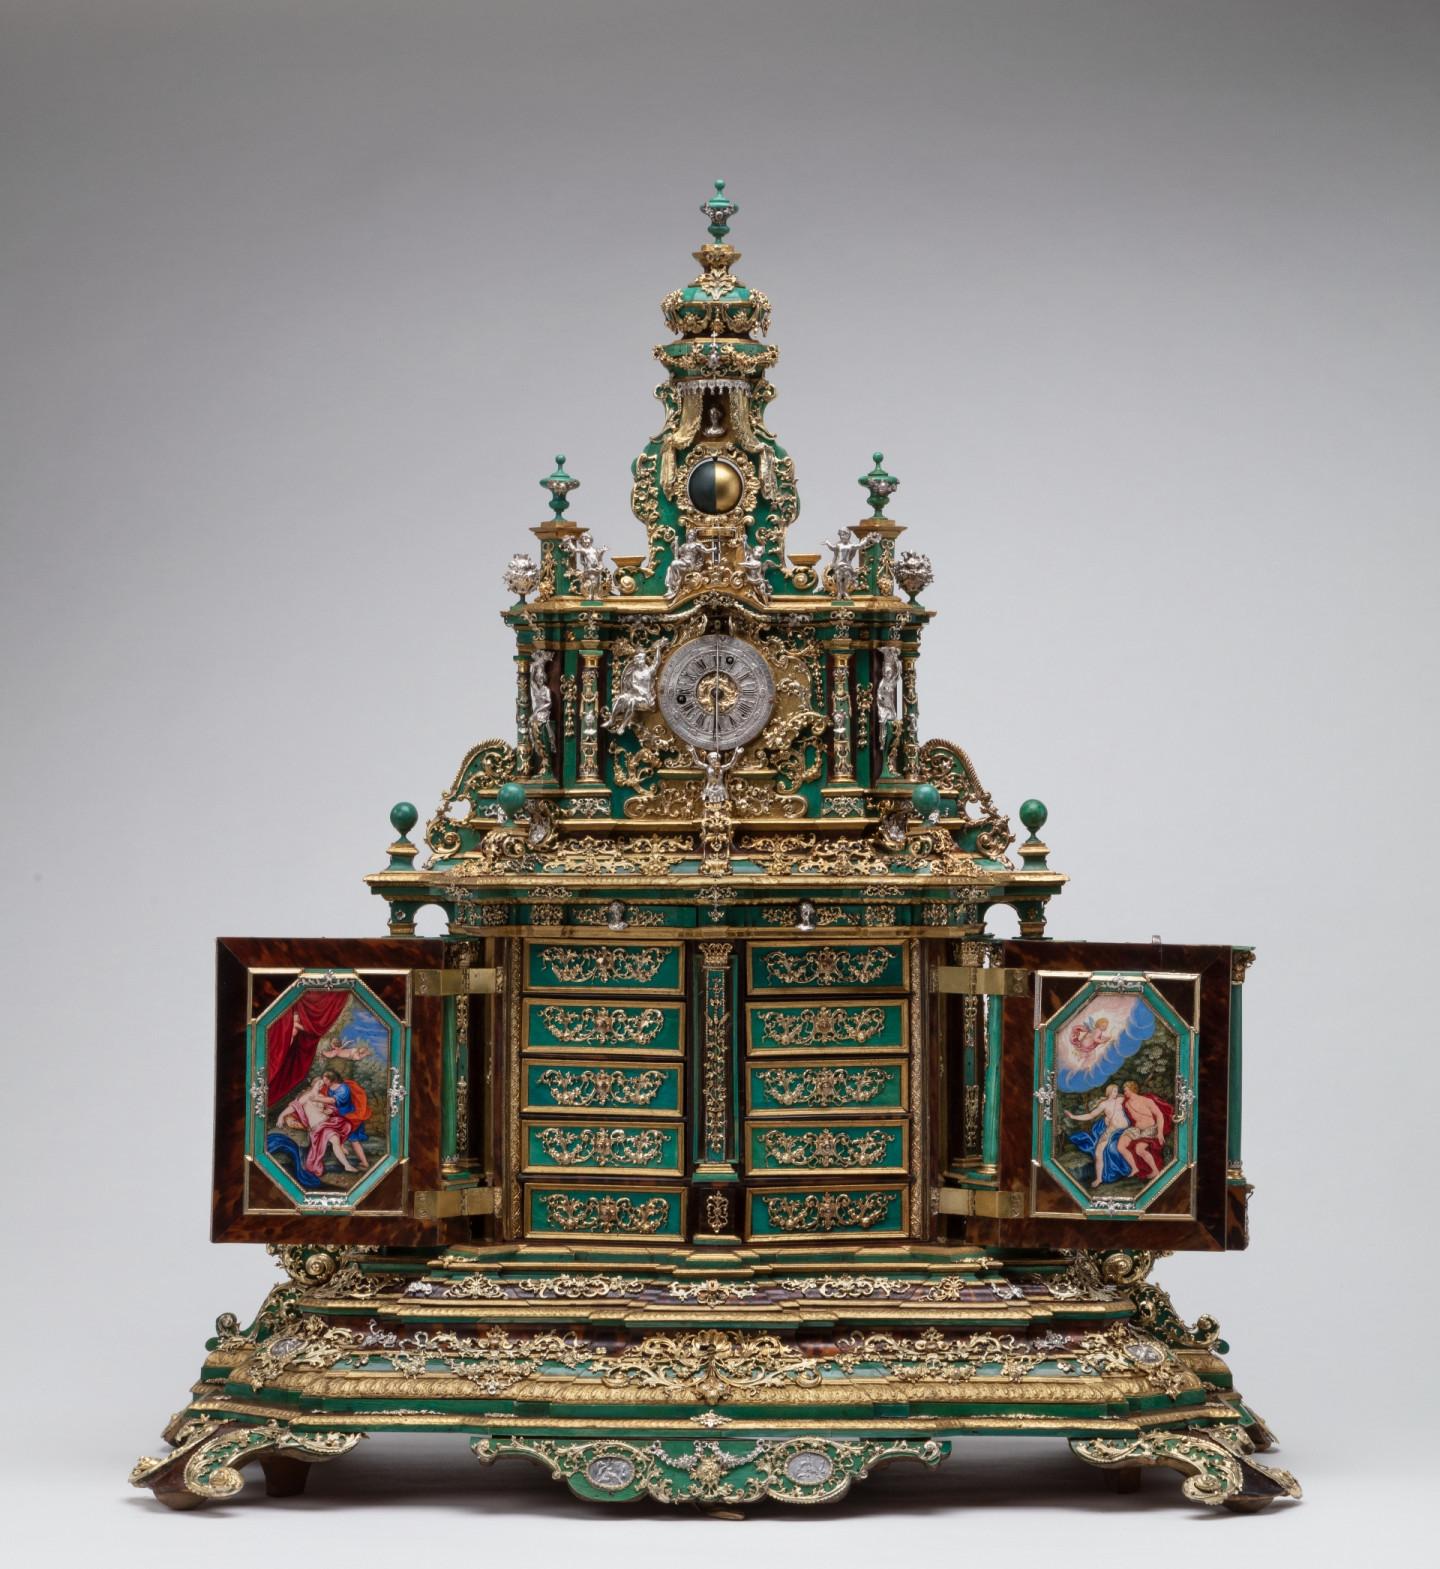 Кабинет с часами, Аугсбург, 1700-1705 годы